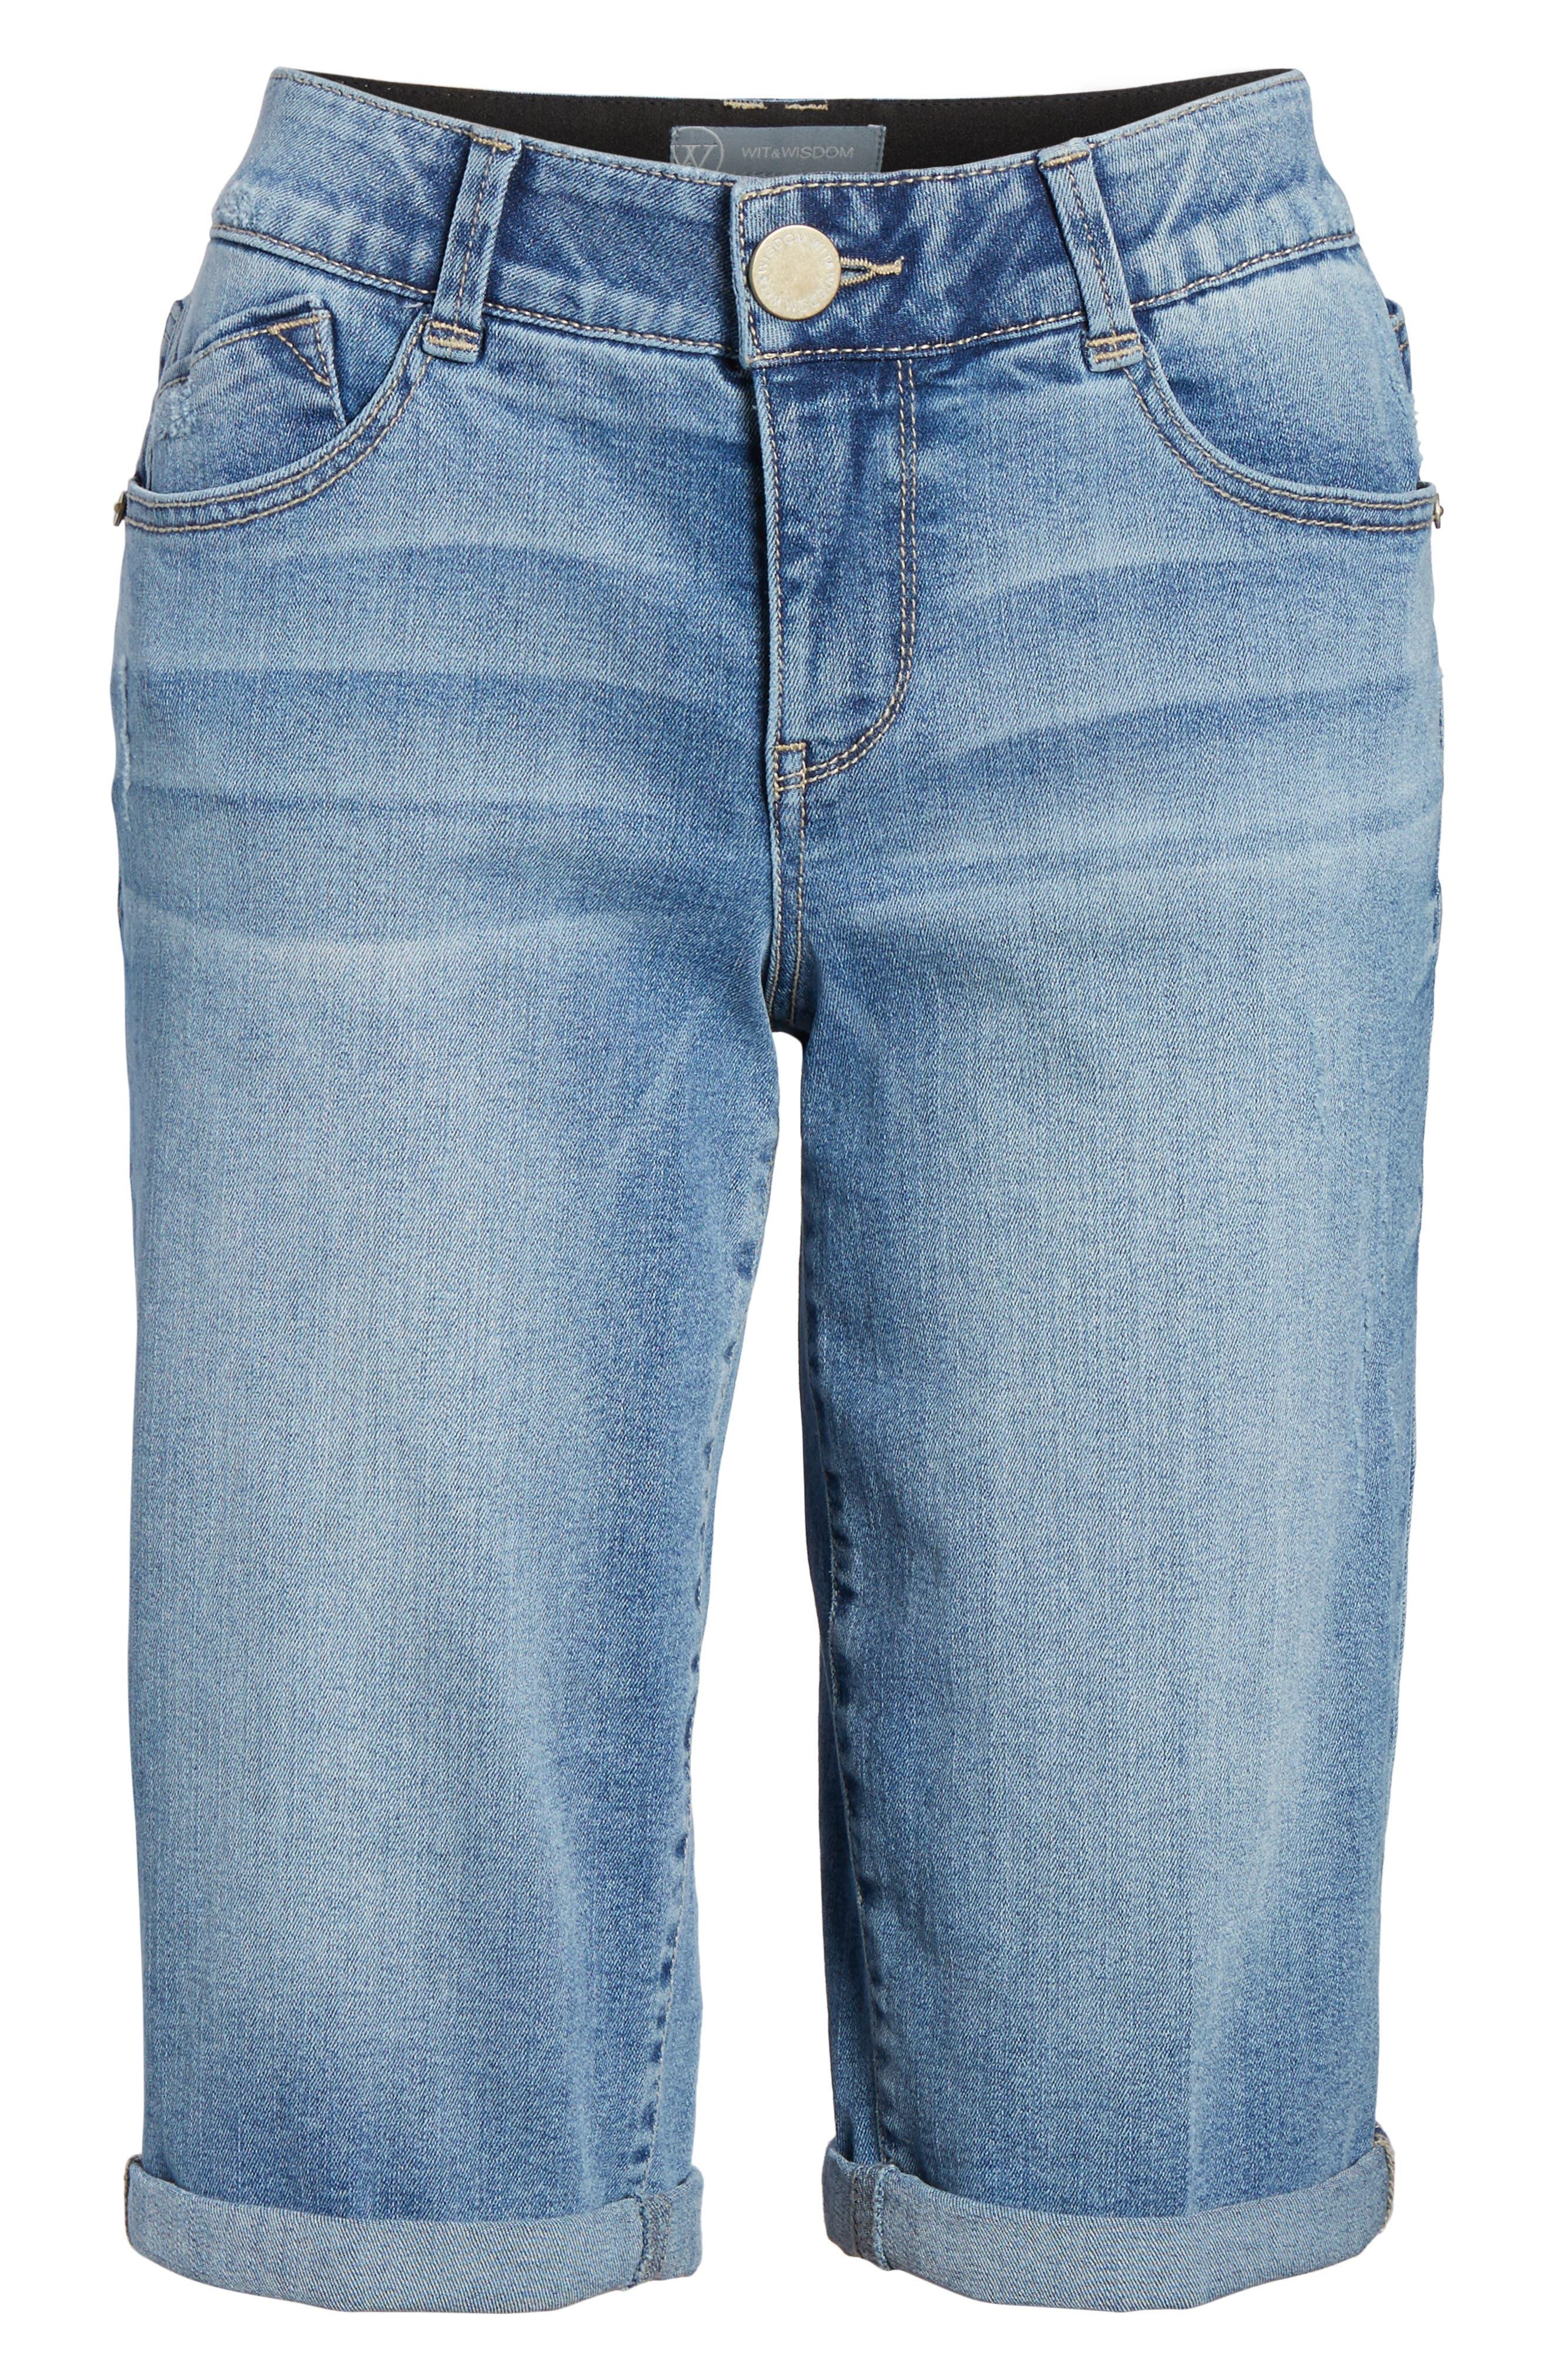 Ab-solution Cuffed Denim Shorts,                             Alternate thumbnail 6, color,                             Light Blue